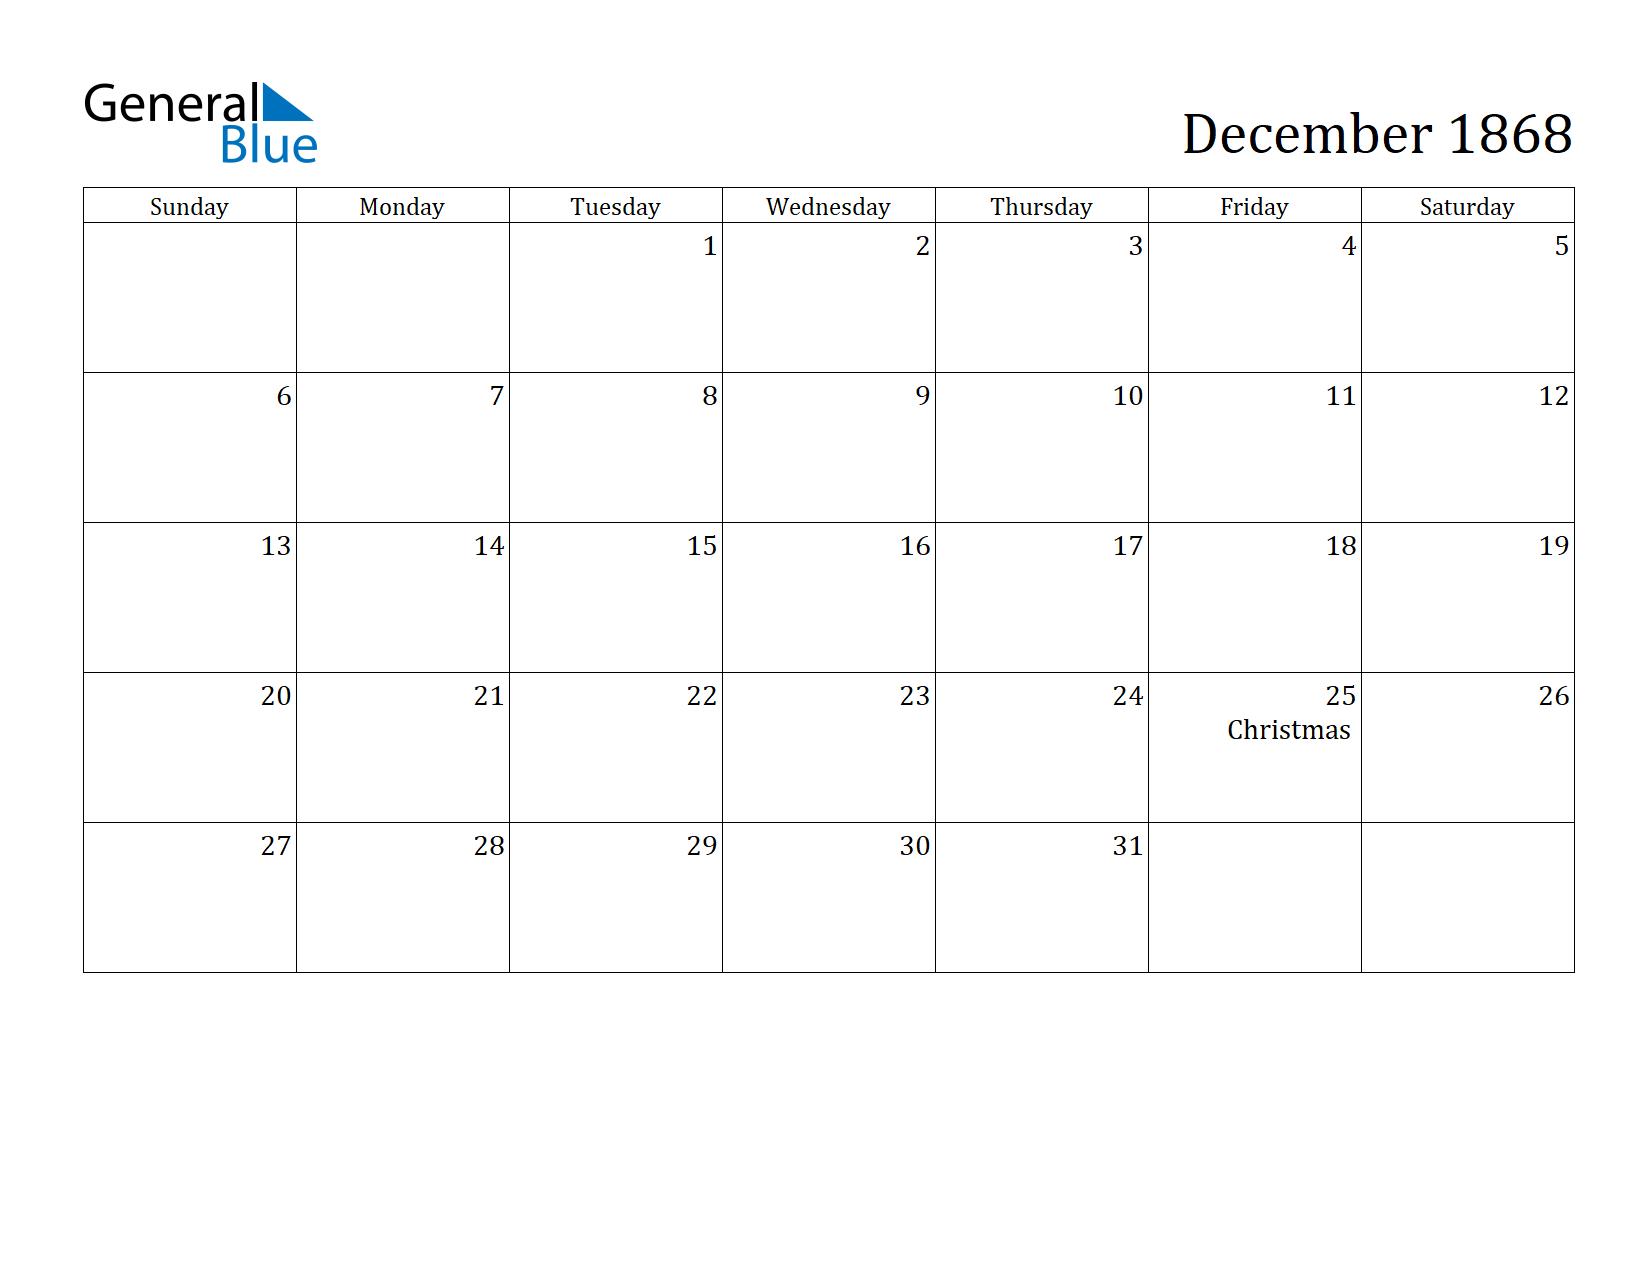 Image of December 1868 Calendar